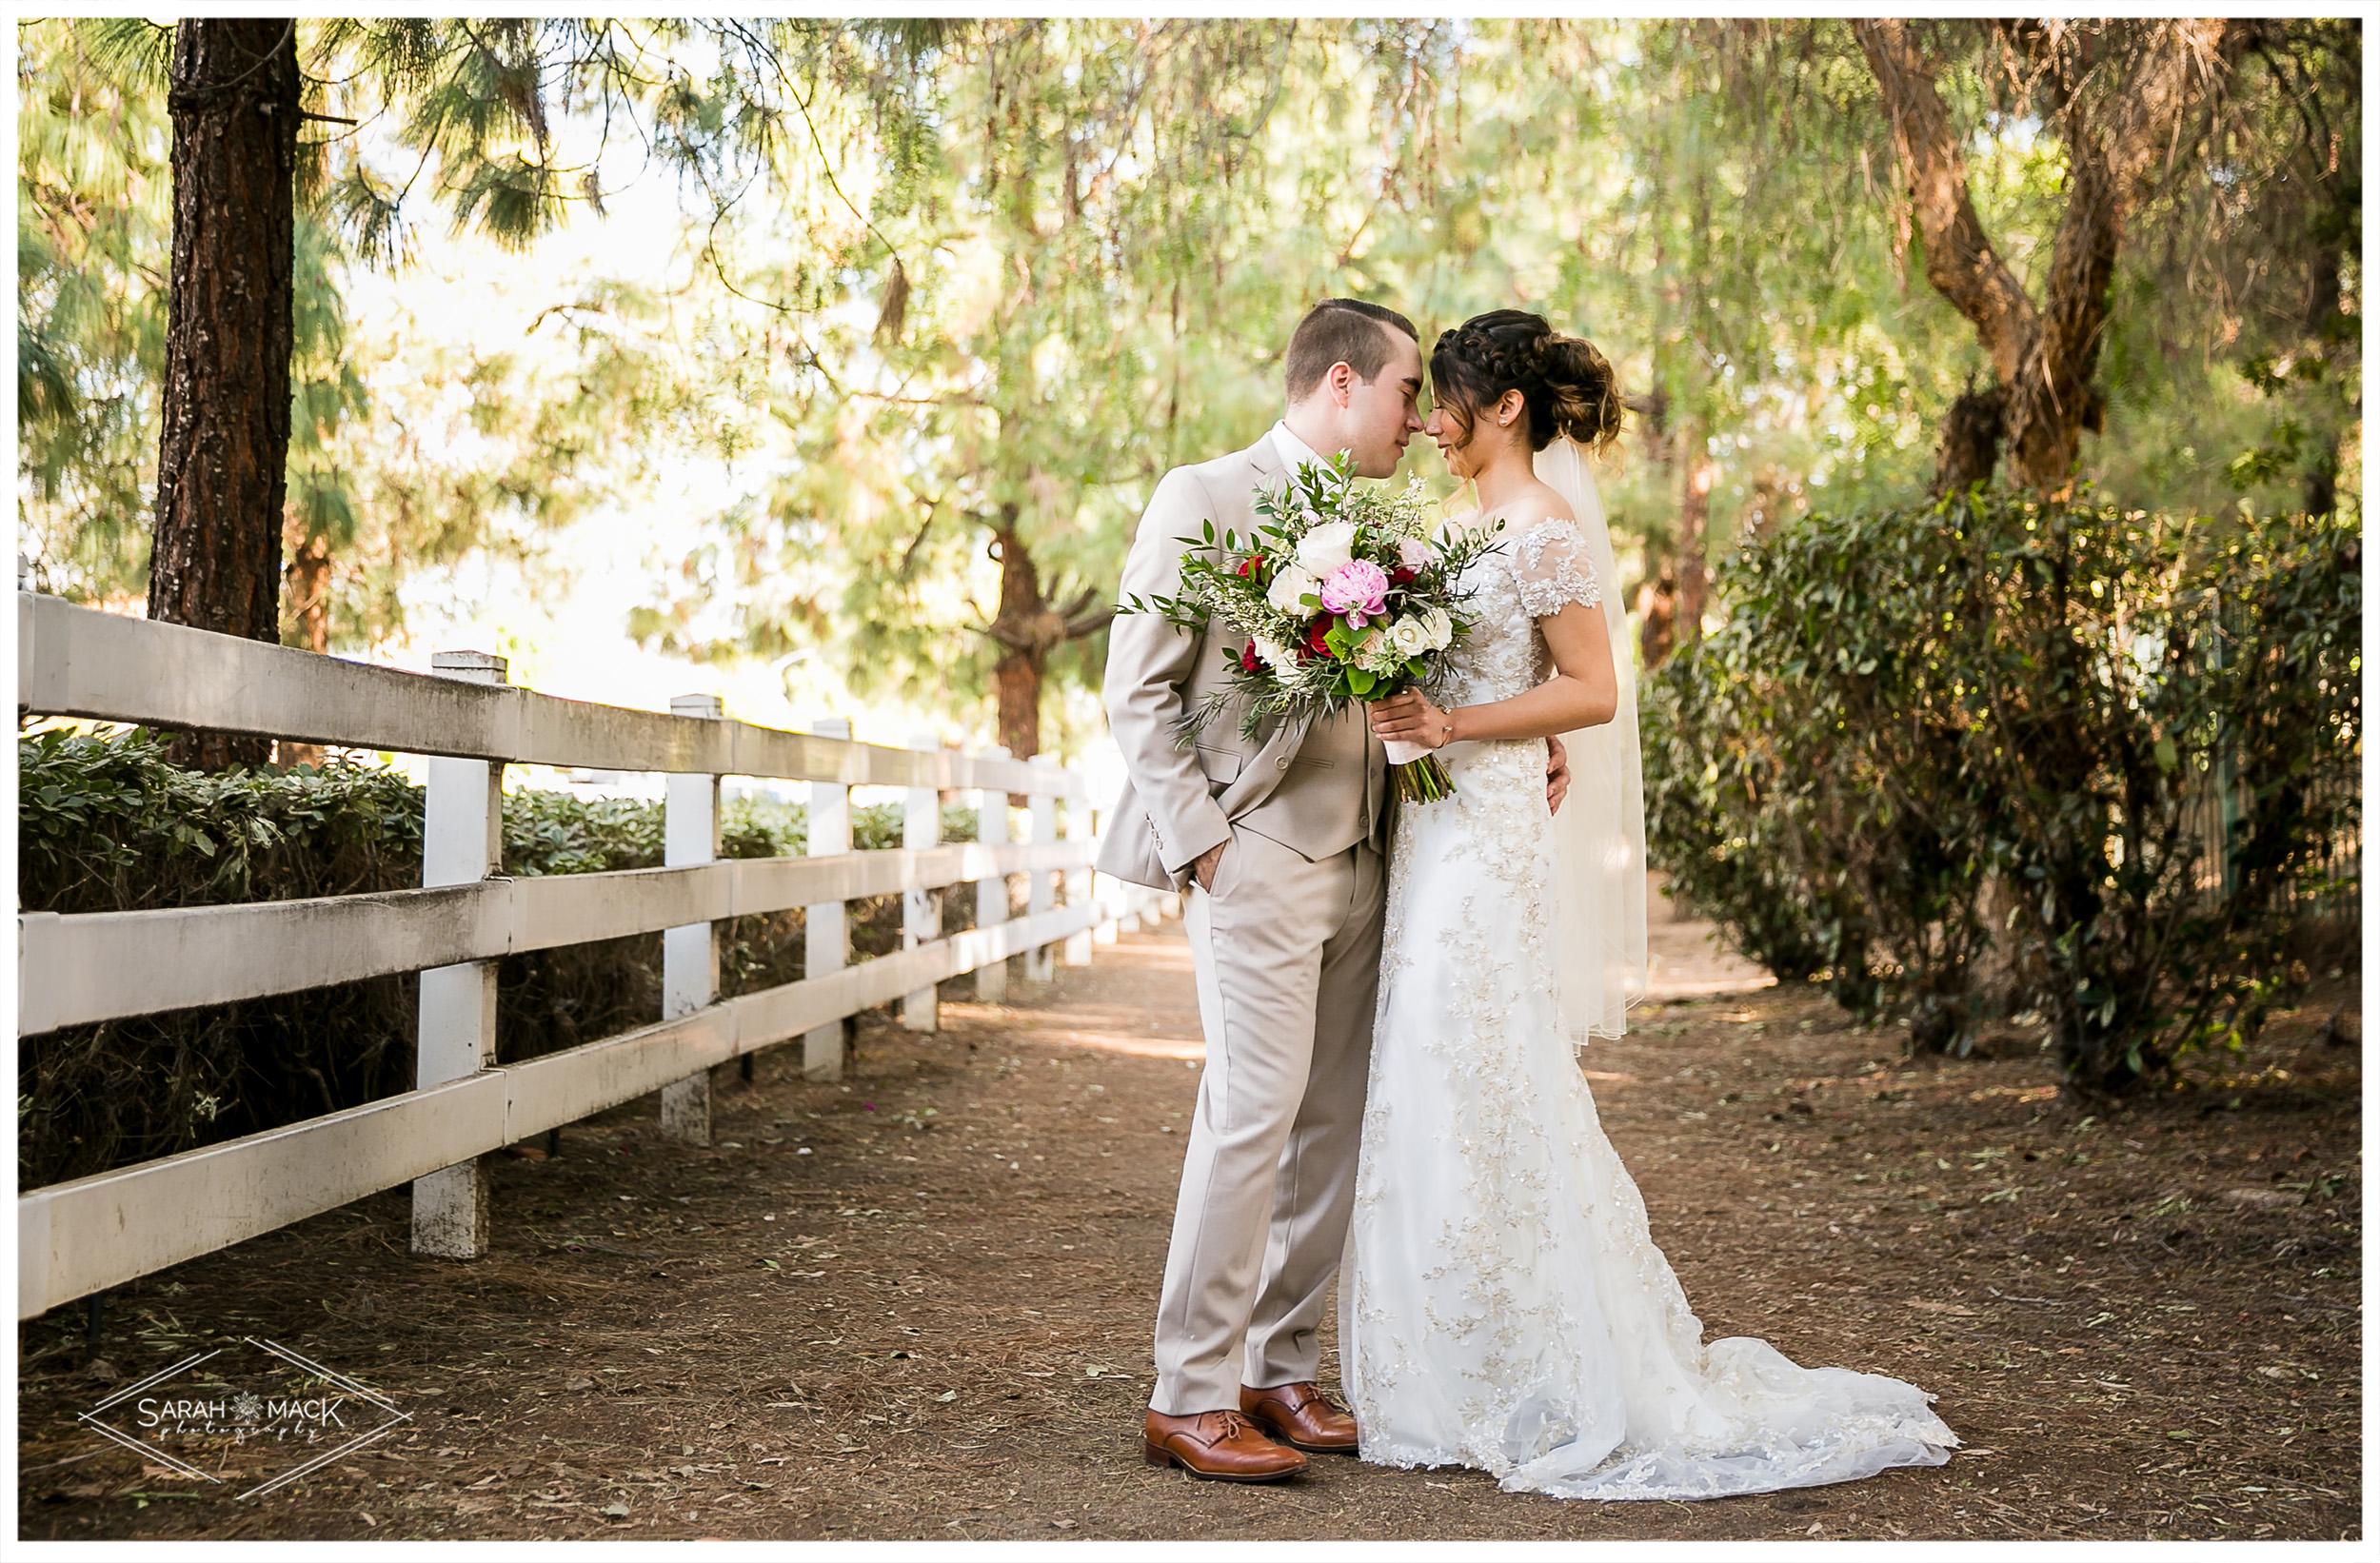 SA-Coyote-Hills-Golf-Course-Fullerton-Wedding-Photography-28.jpg